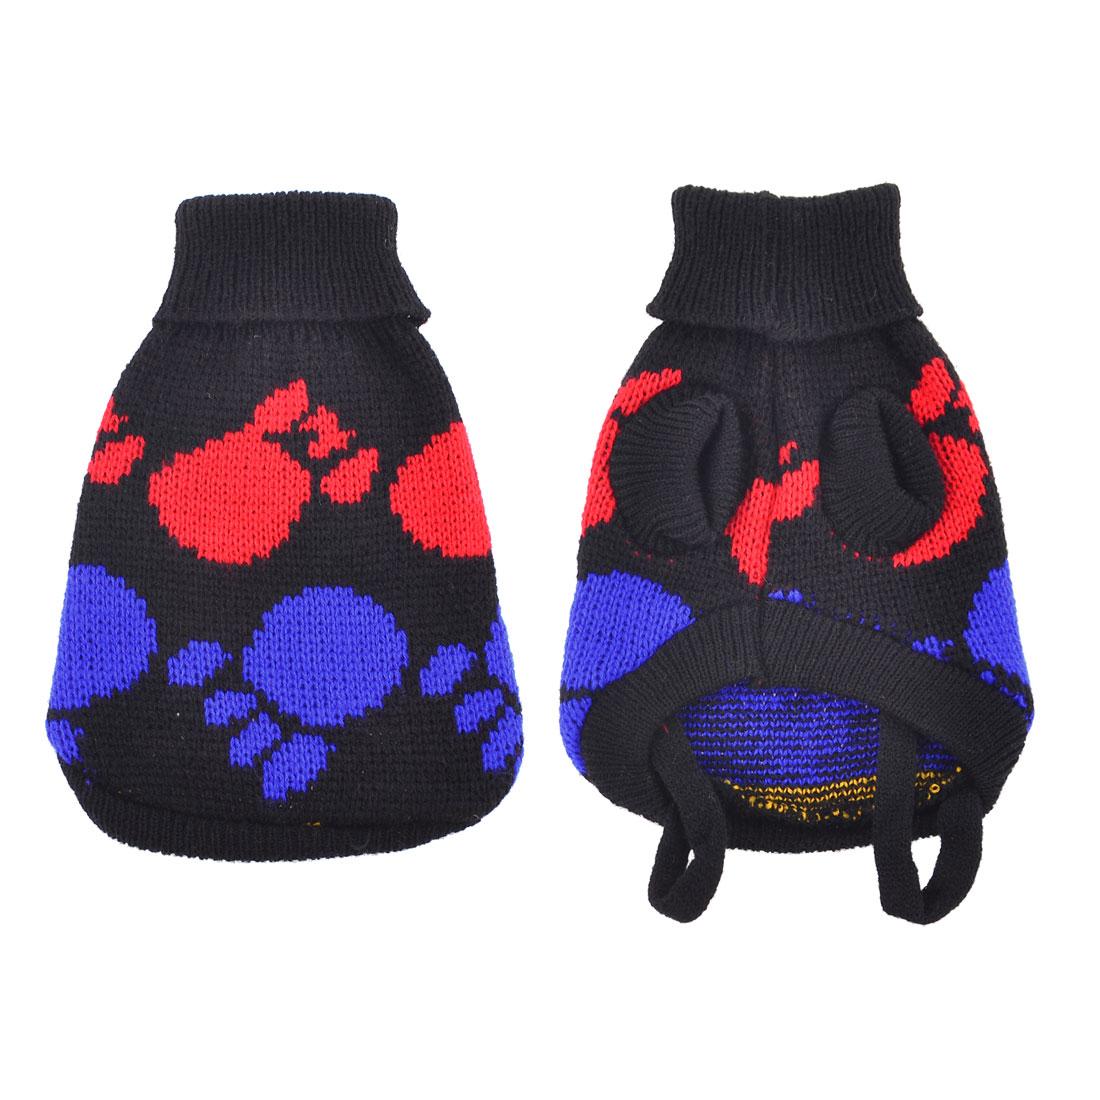 Pet Dog Yorkie Black Blue Knitted Turtleneck Paw Print Sweater Apparel Size XXS